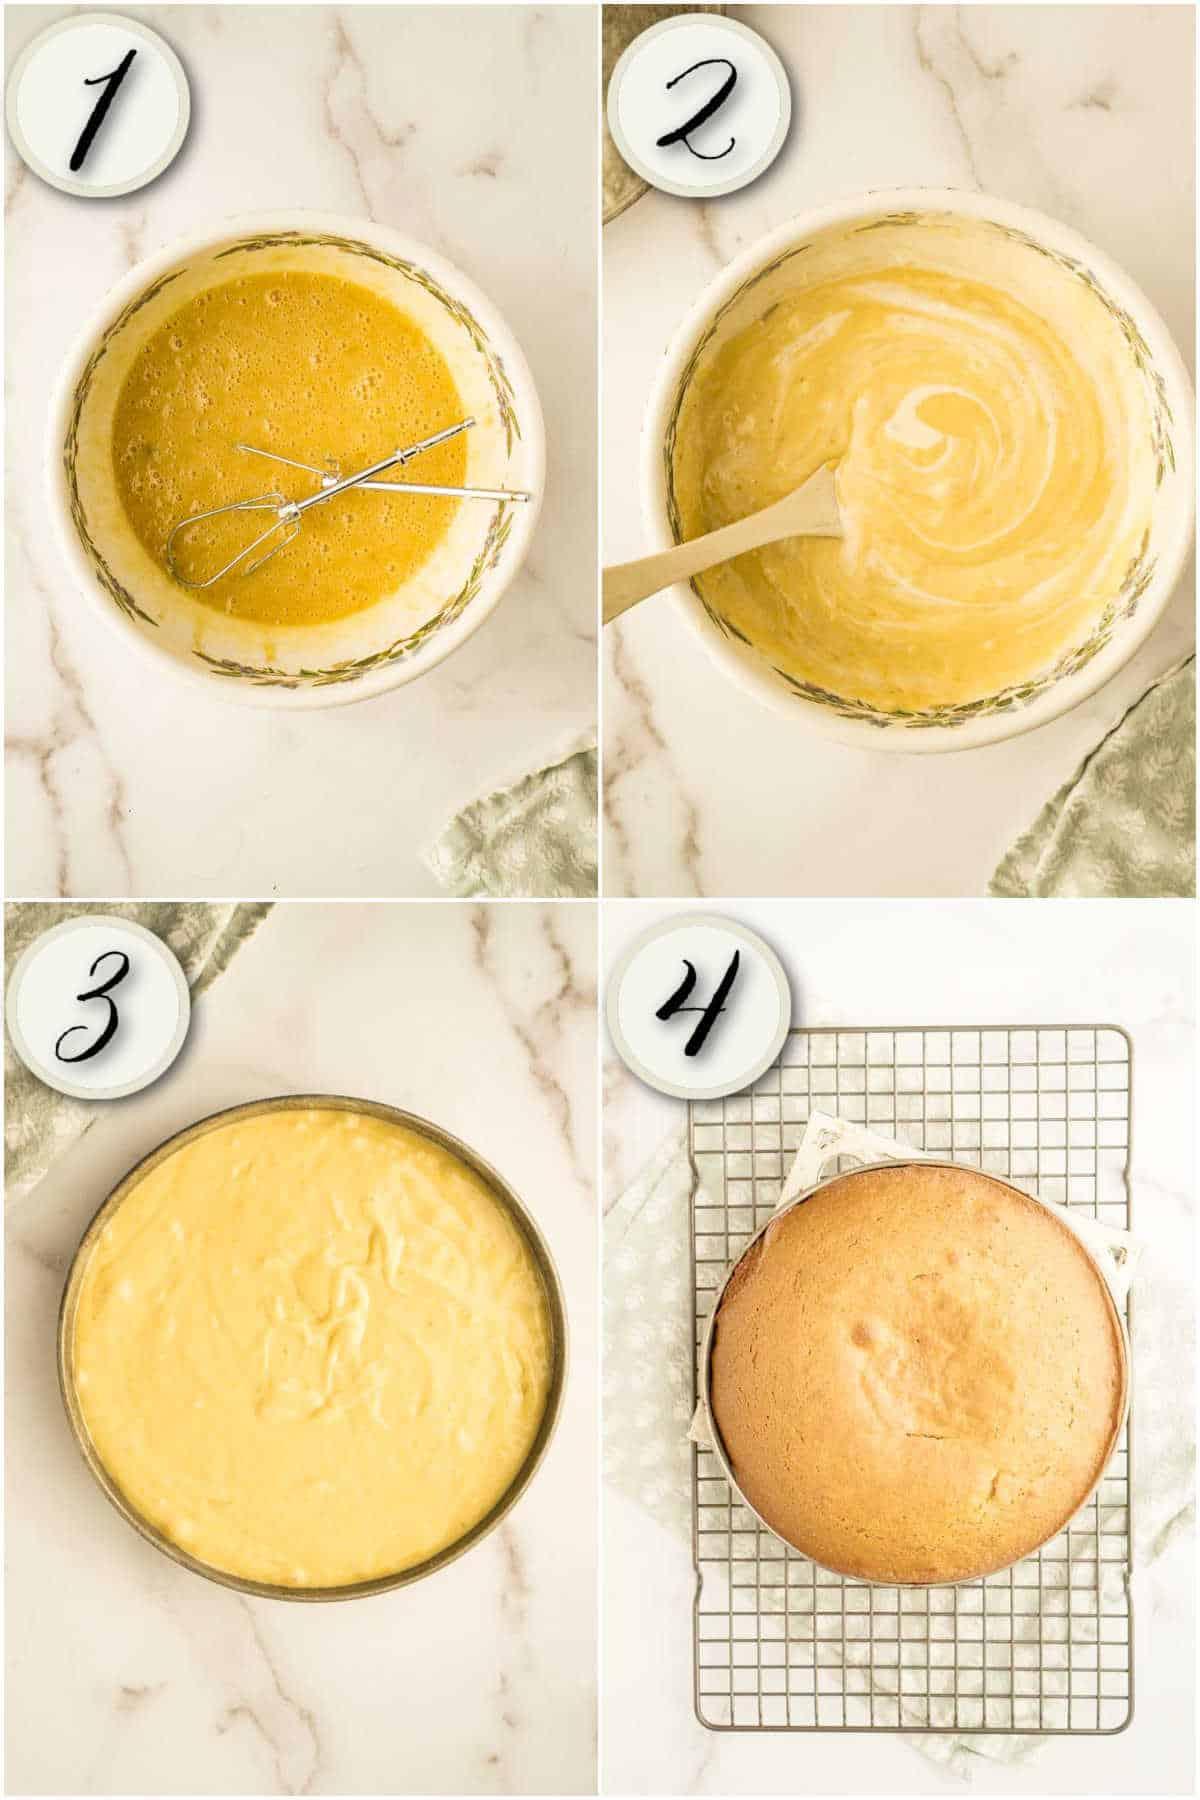 process of making sourdough banana cake- beating sugar, oil, and bananas, mixing in dry ingredients, adding starter, and baking